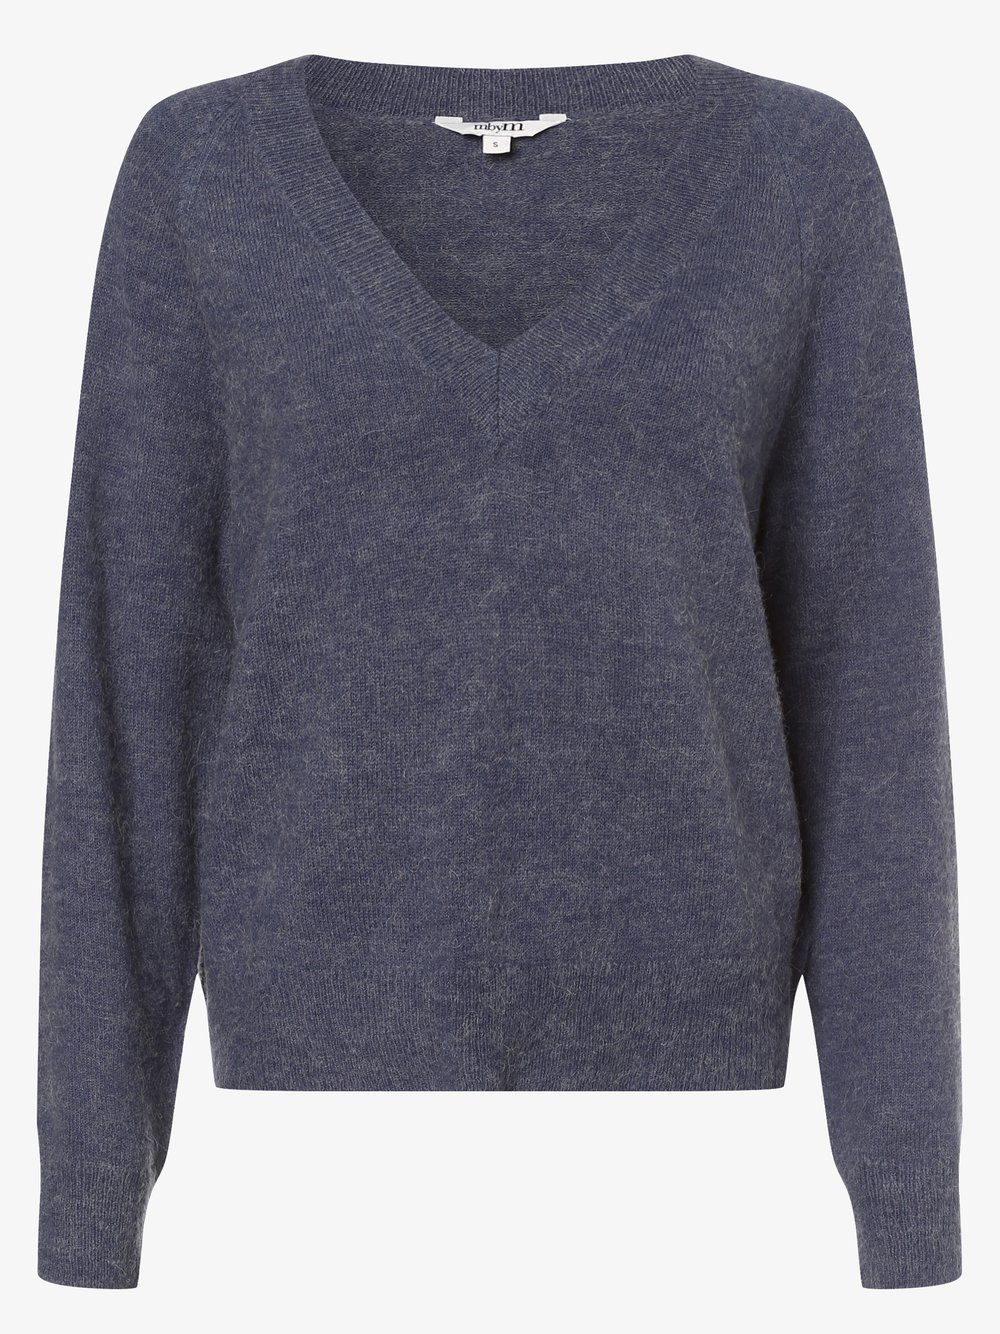 mbyM – Sweter damski z dodatkiem alpaki – Perlee, niebieski Van Graaf 484624-0002-09920